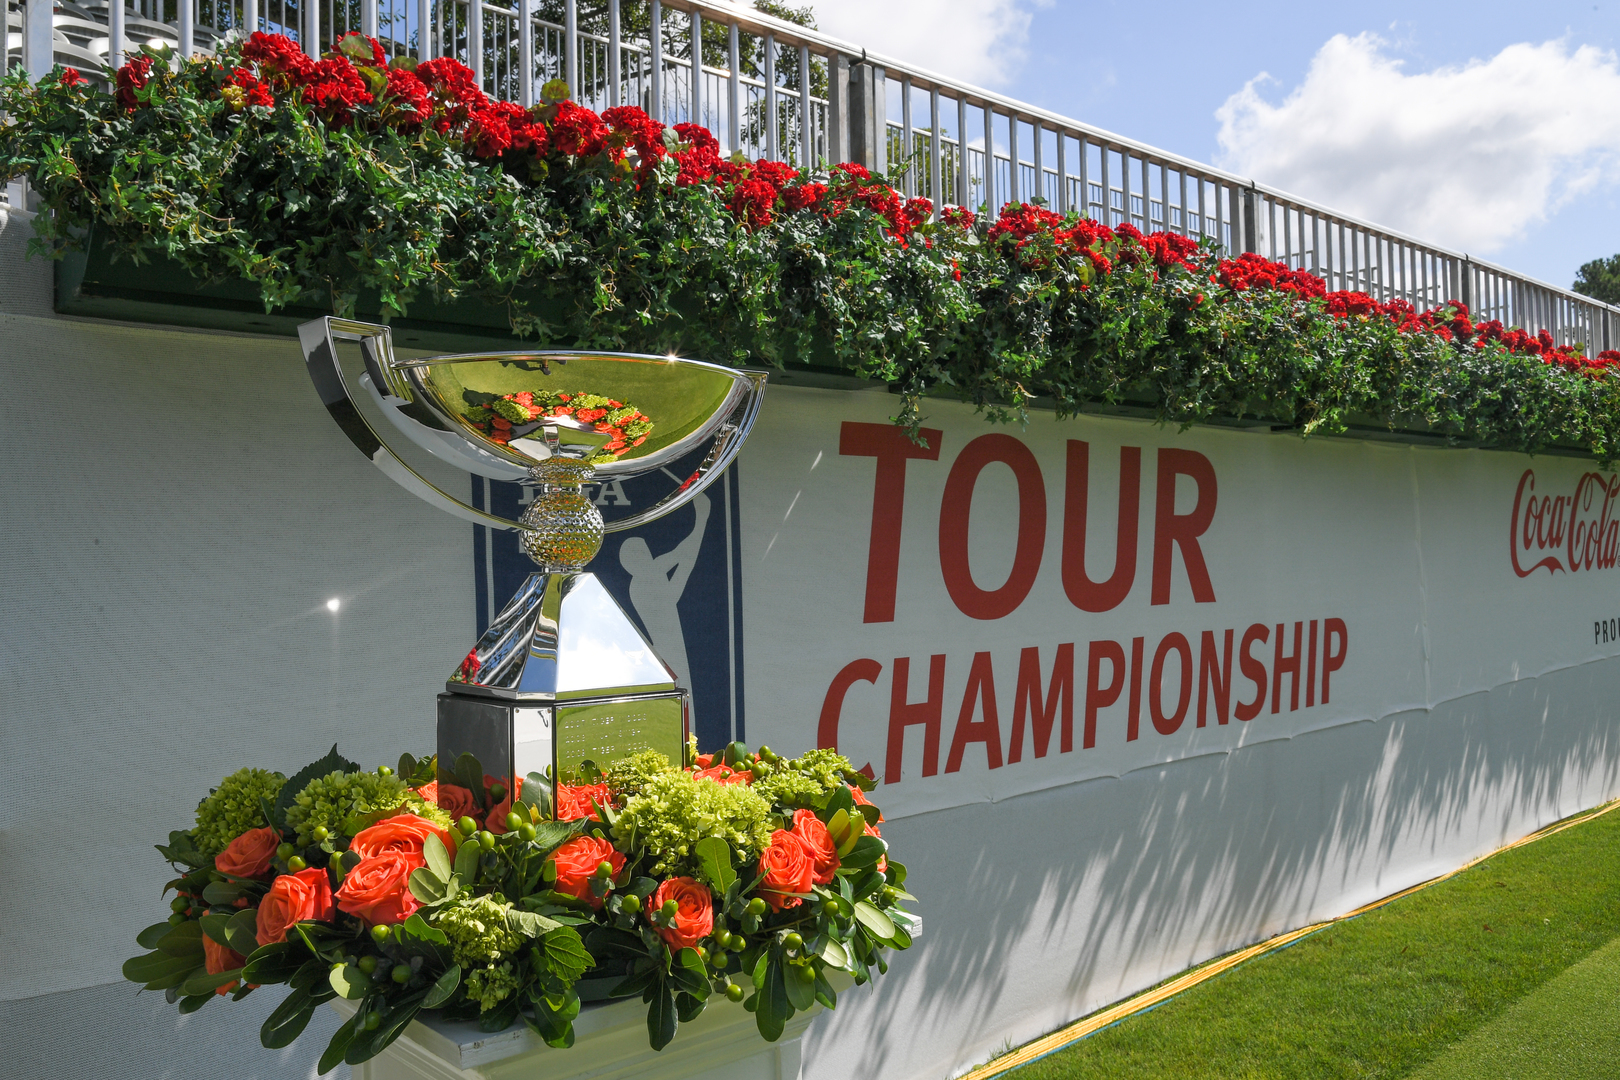 TOUR Championship 2021